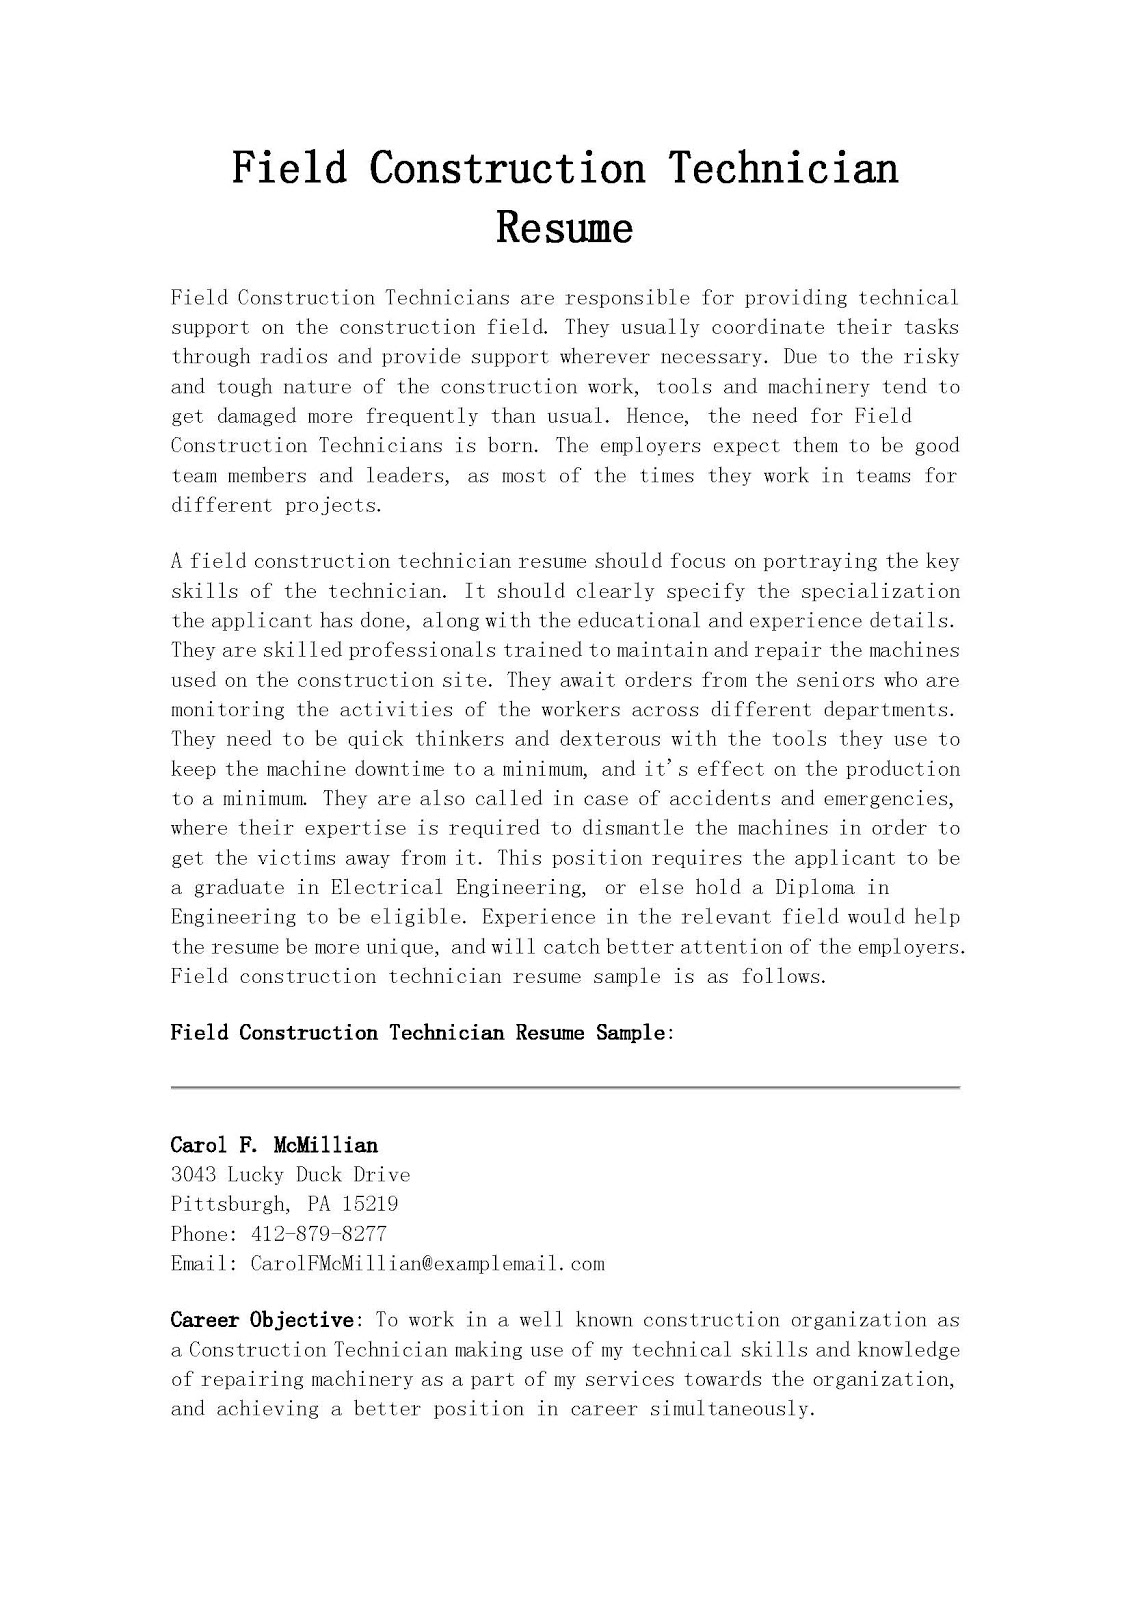 resume samples  field construction technician resume